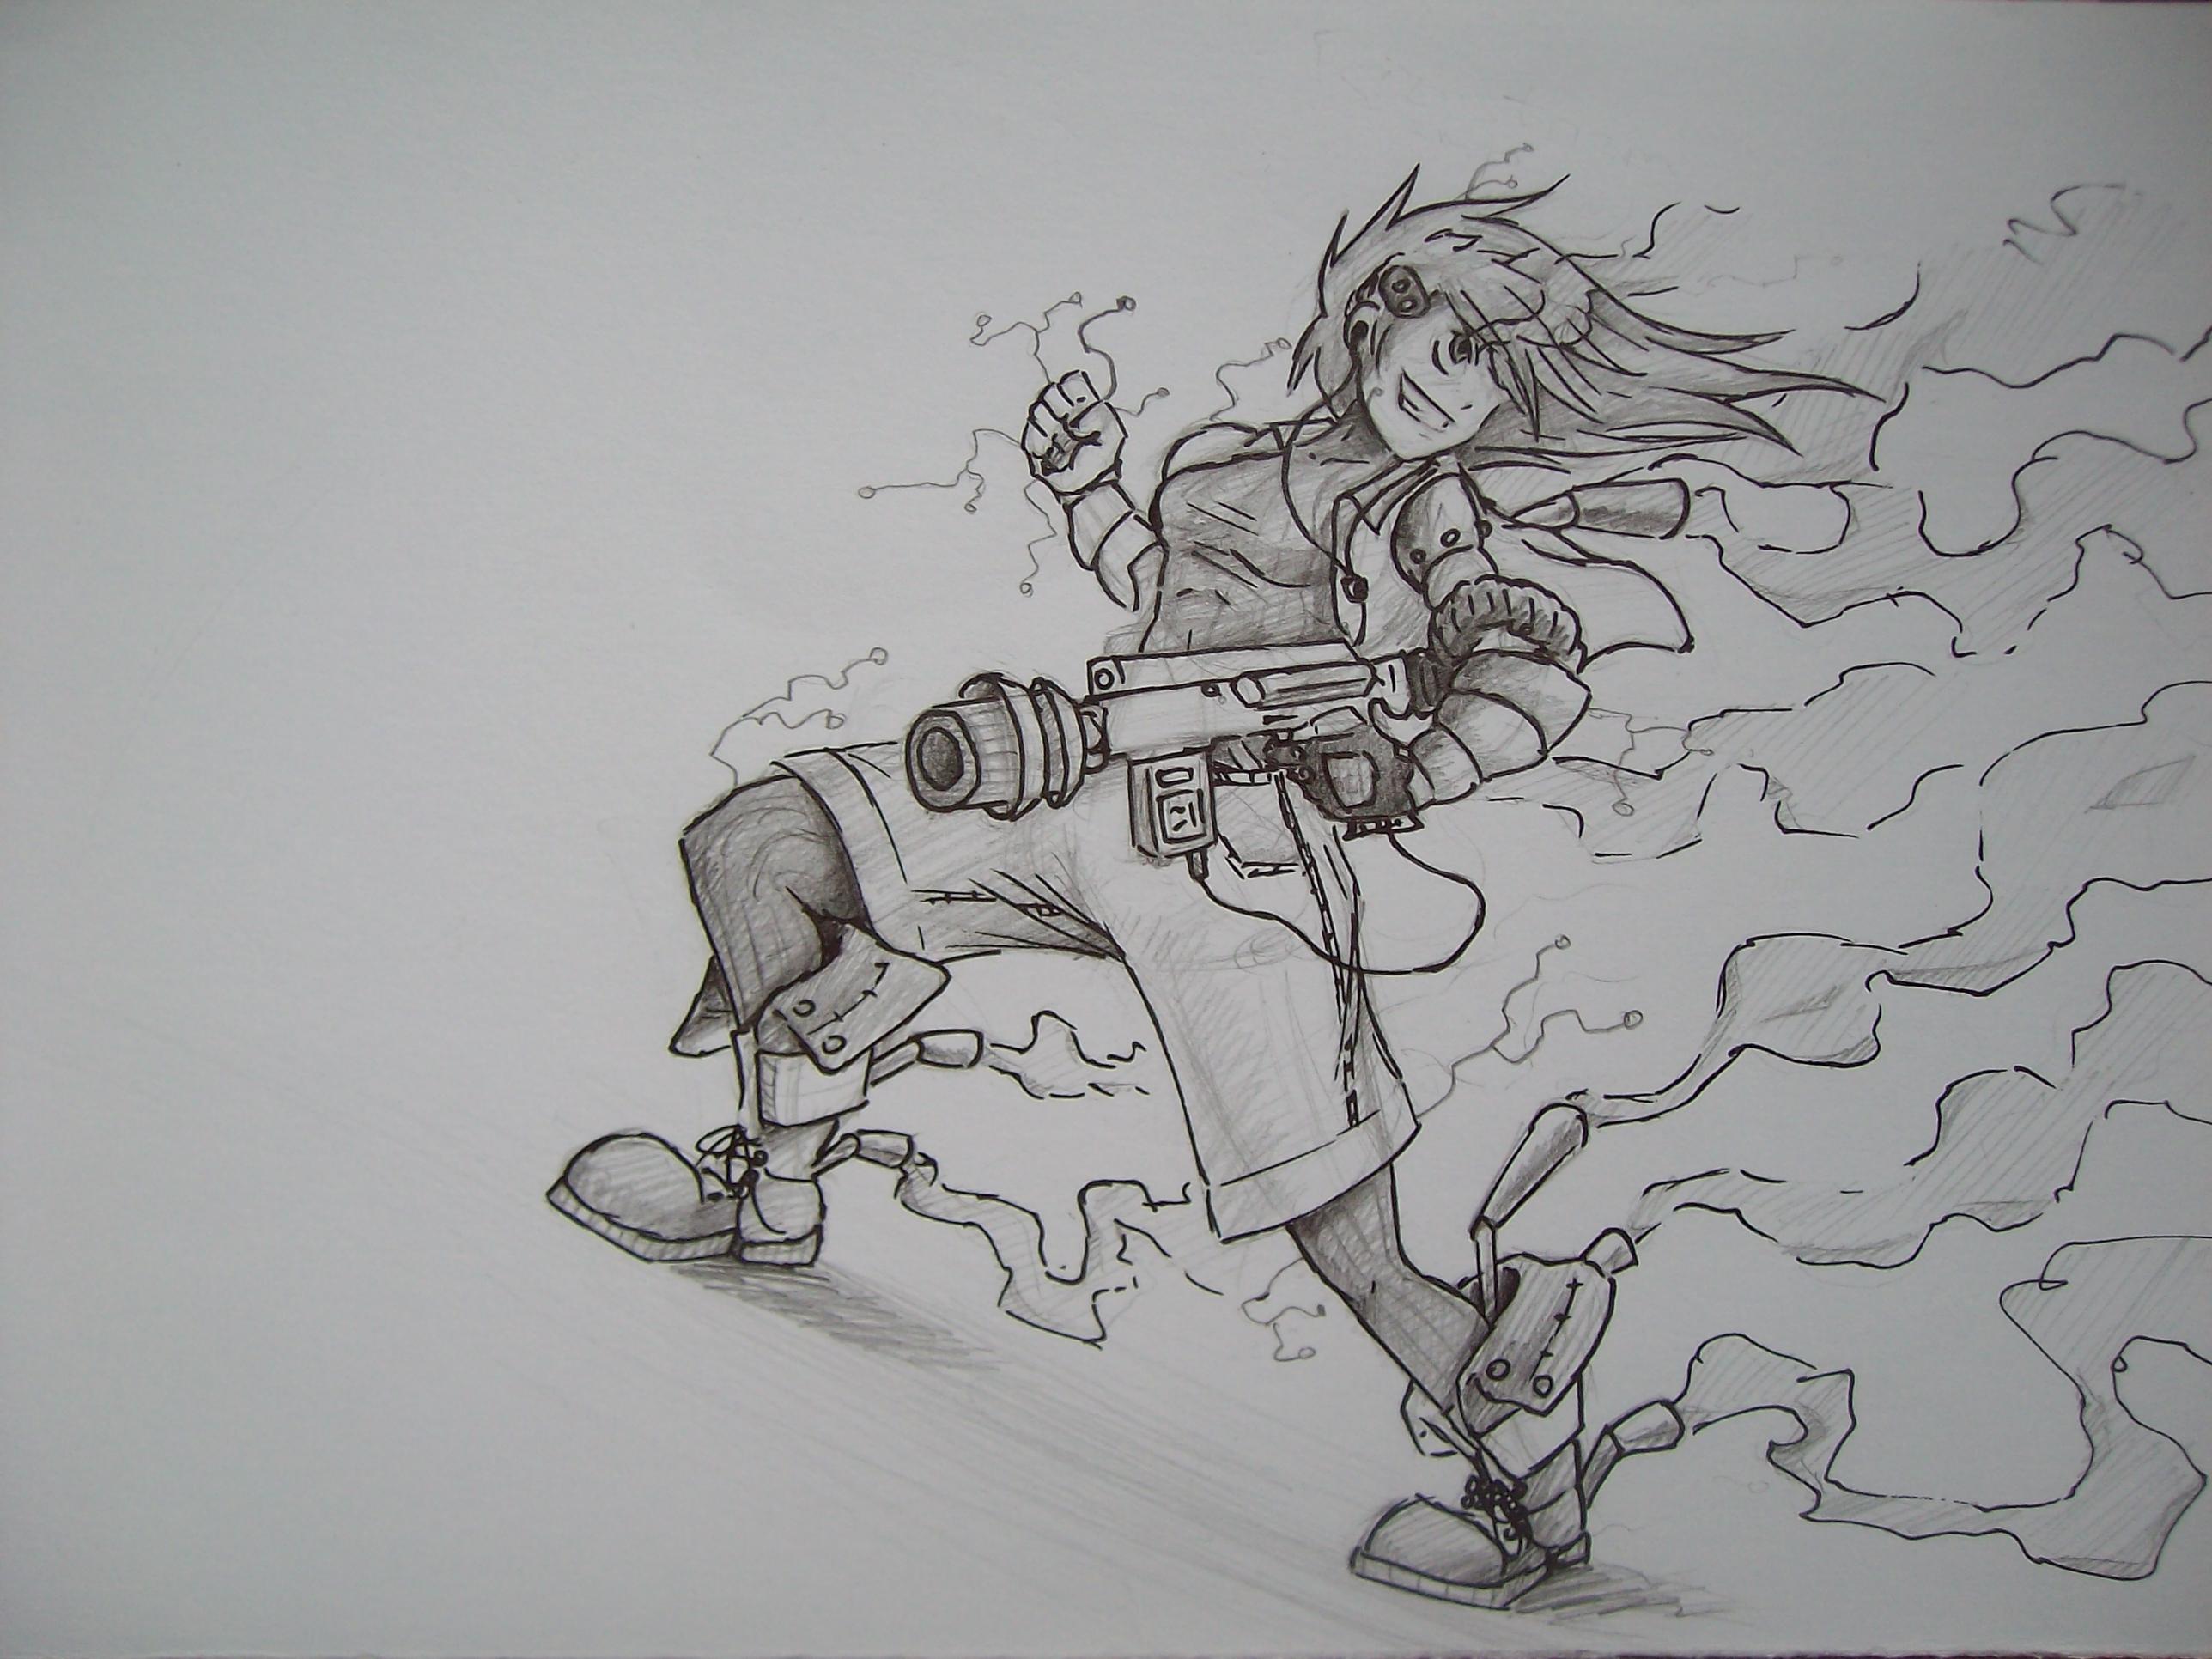 S. - Blaster